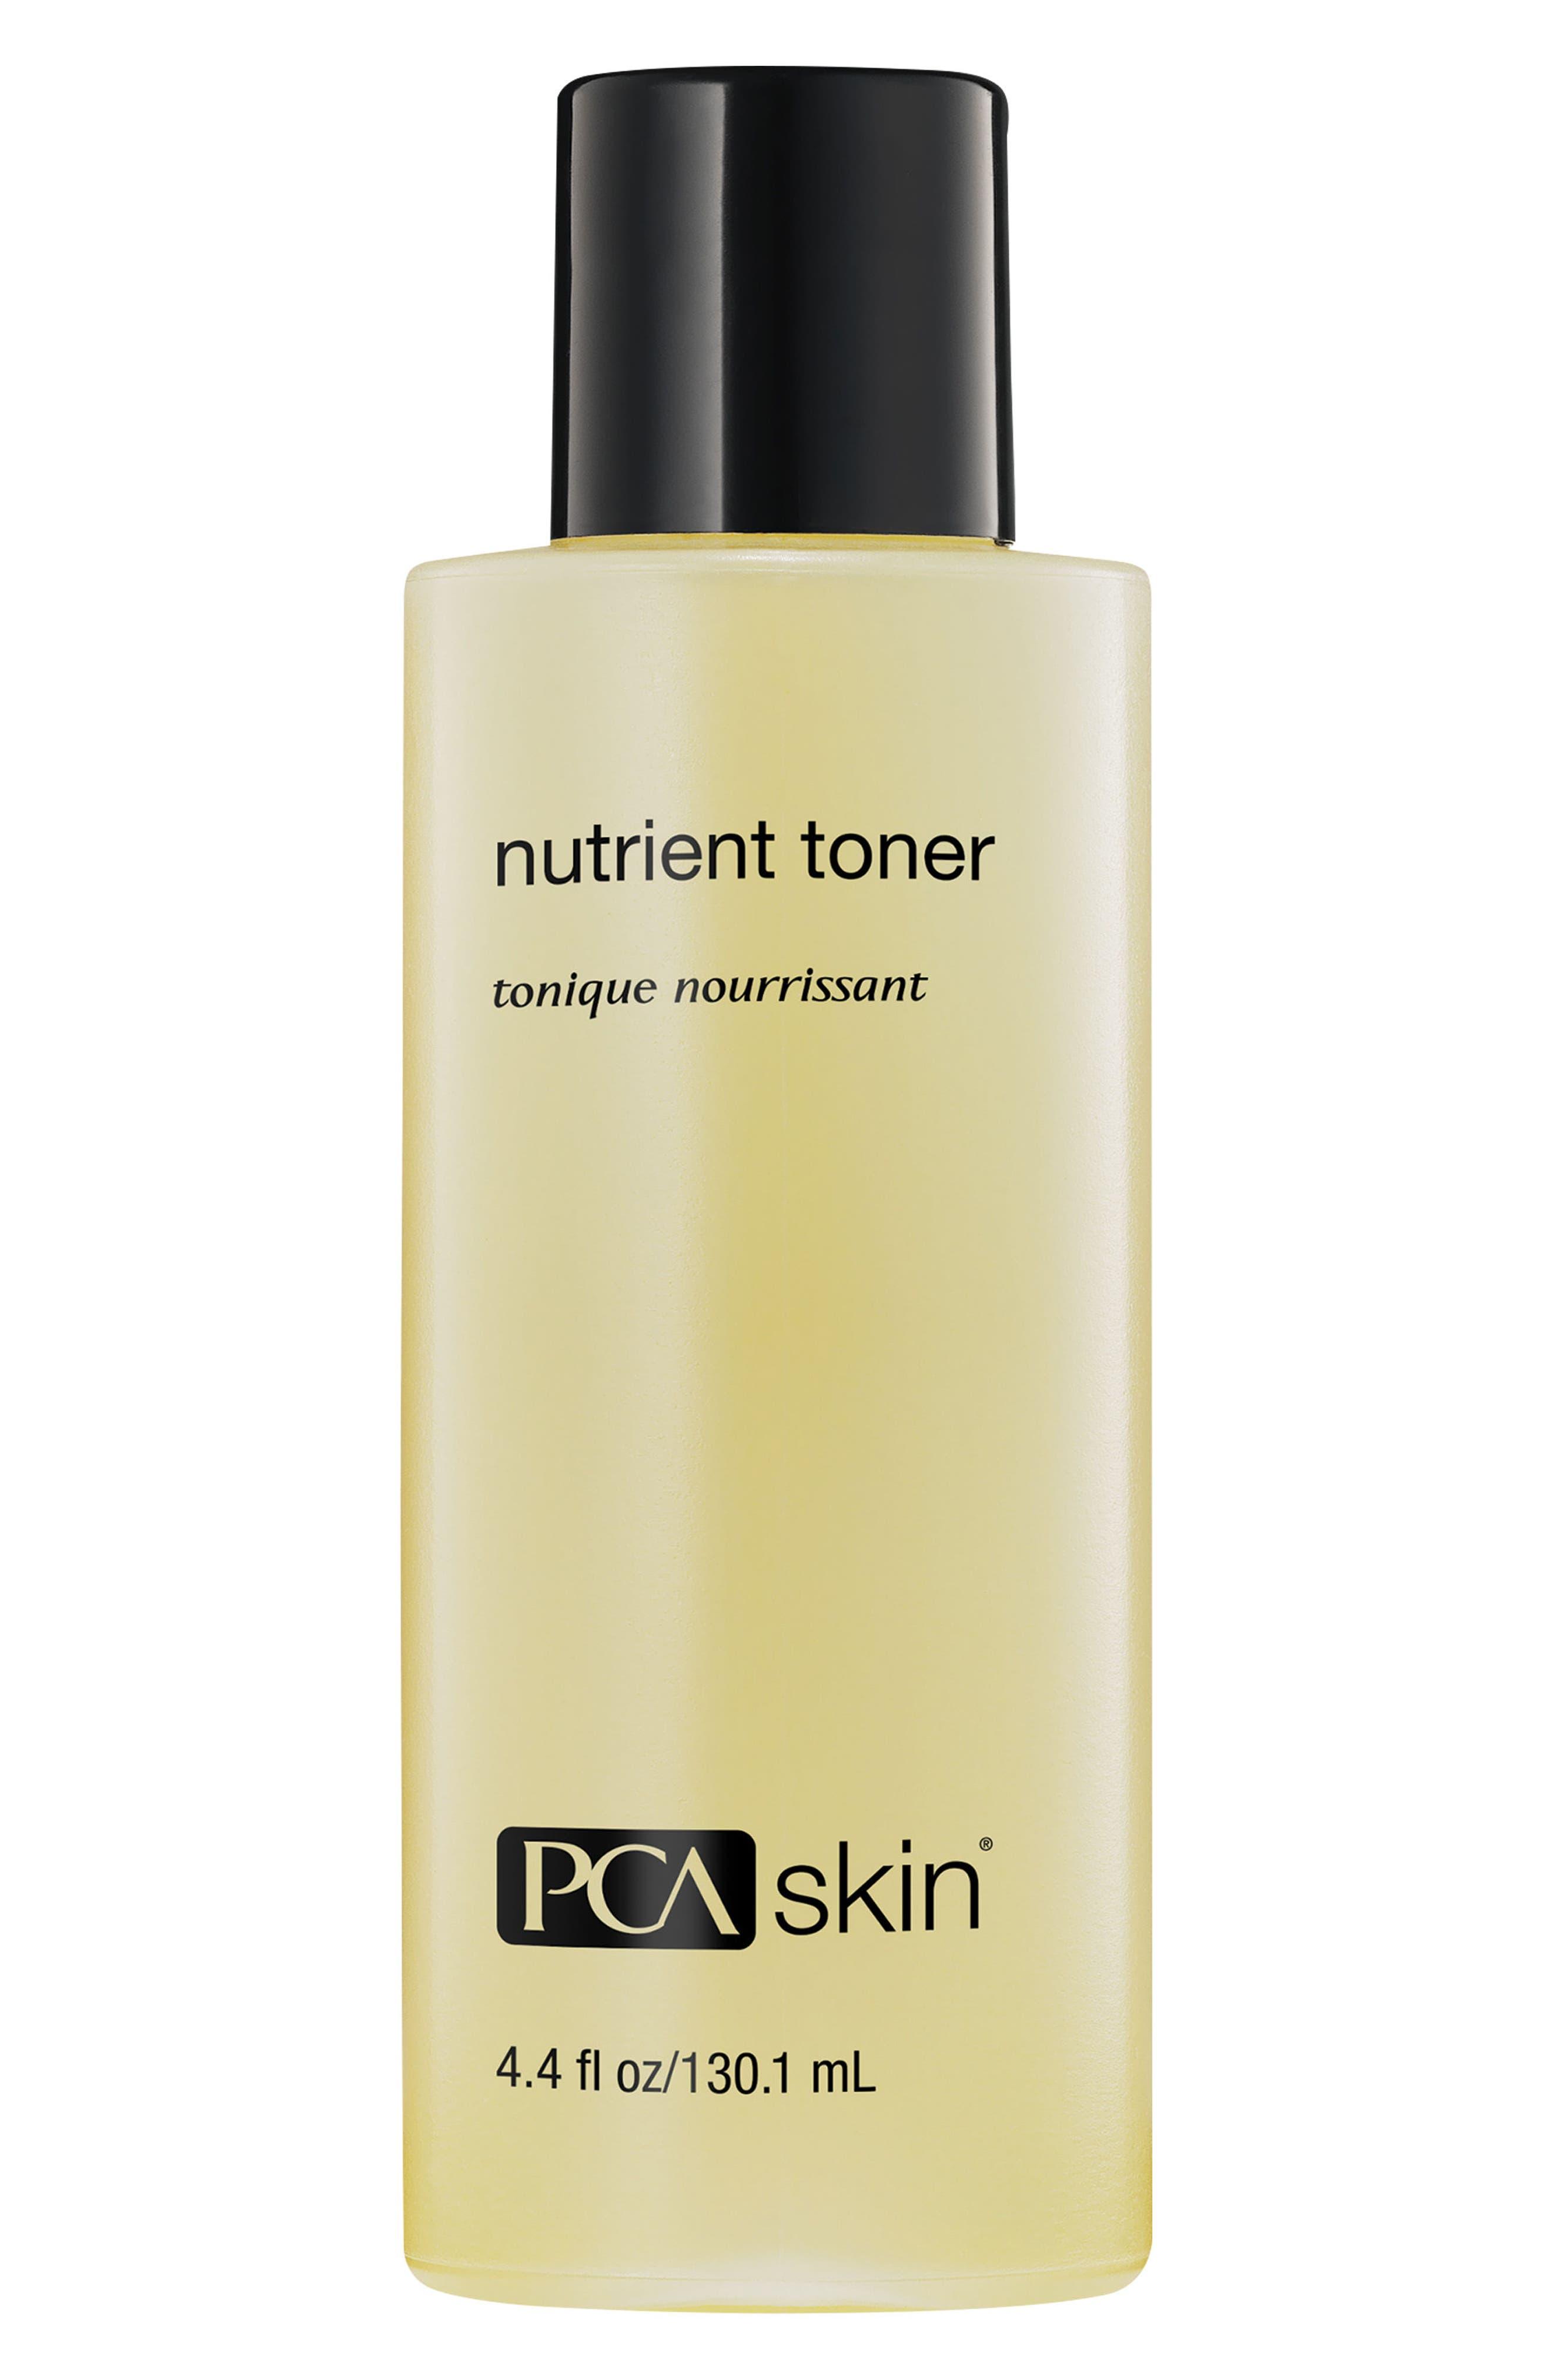 PCA SKIN Nutrient Toner, Main, color, NO COLOR